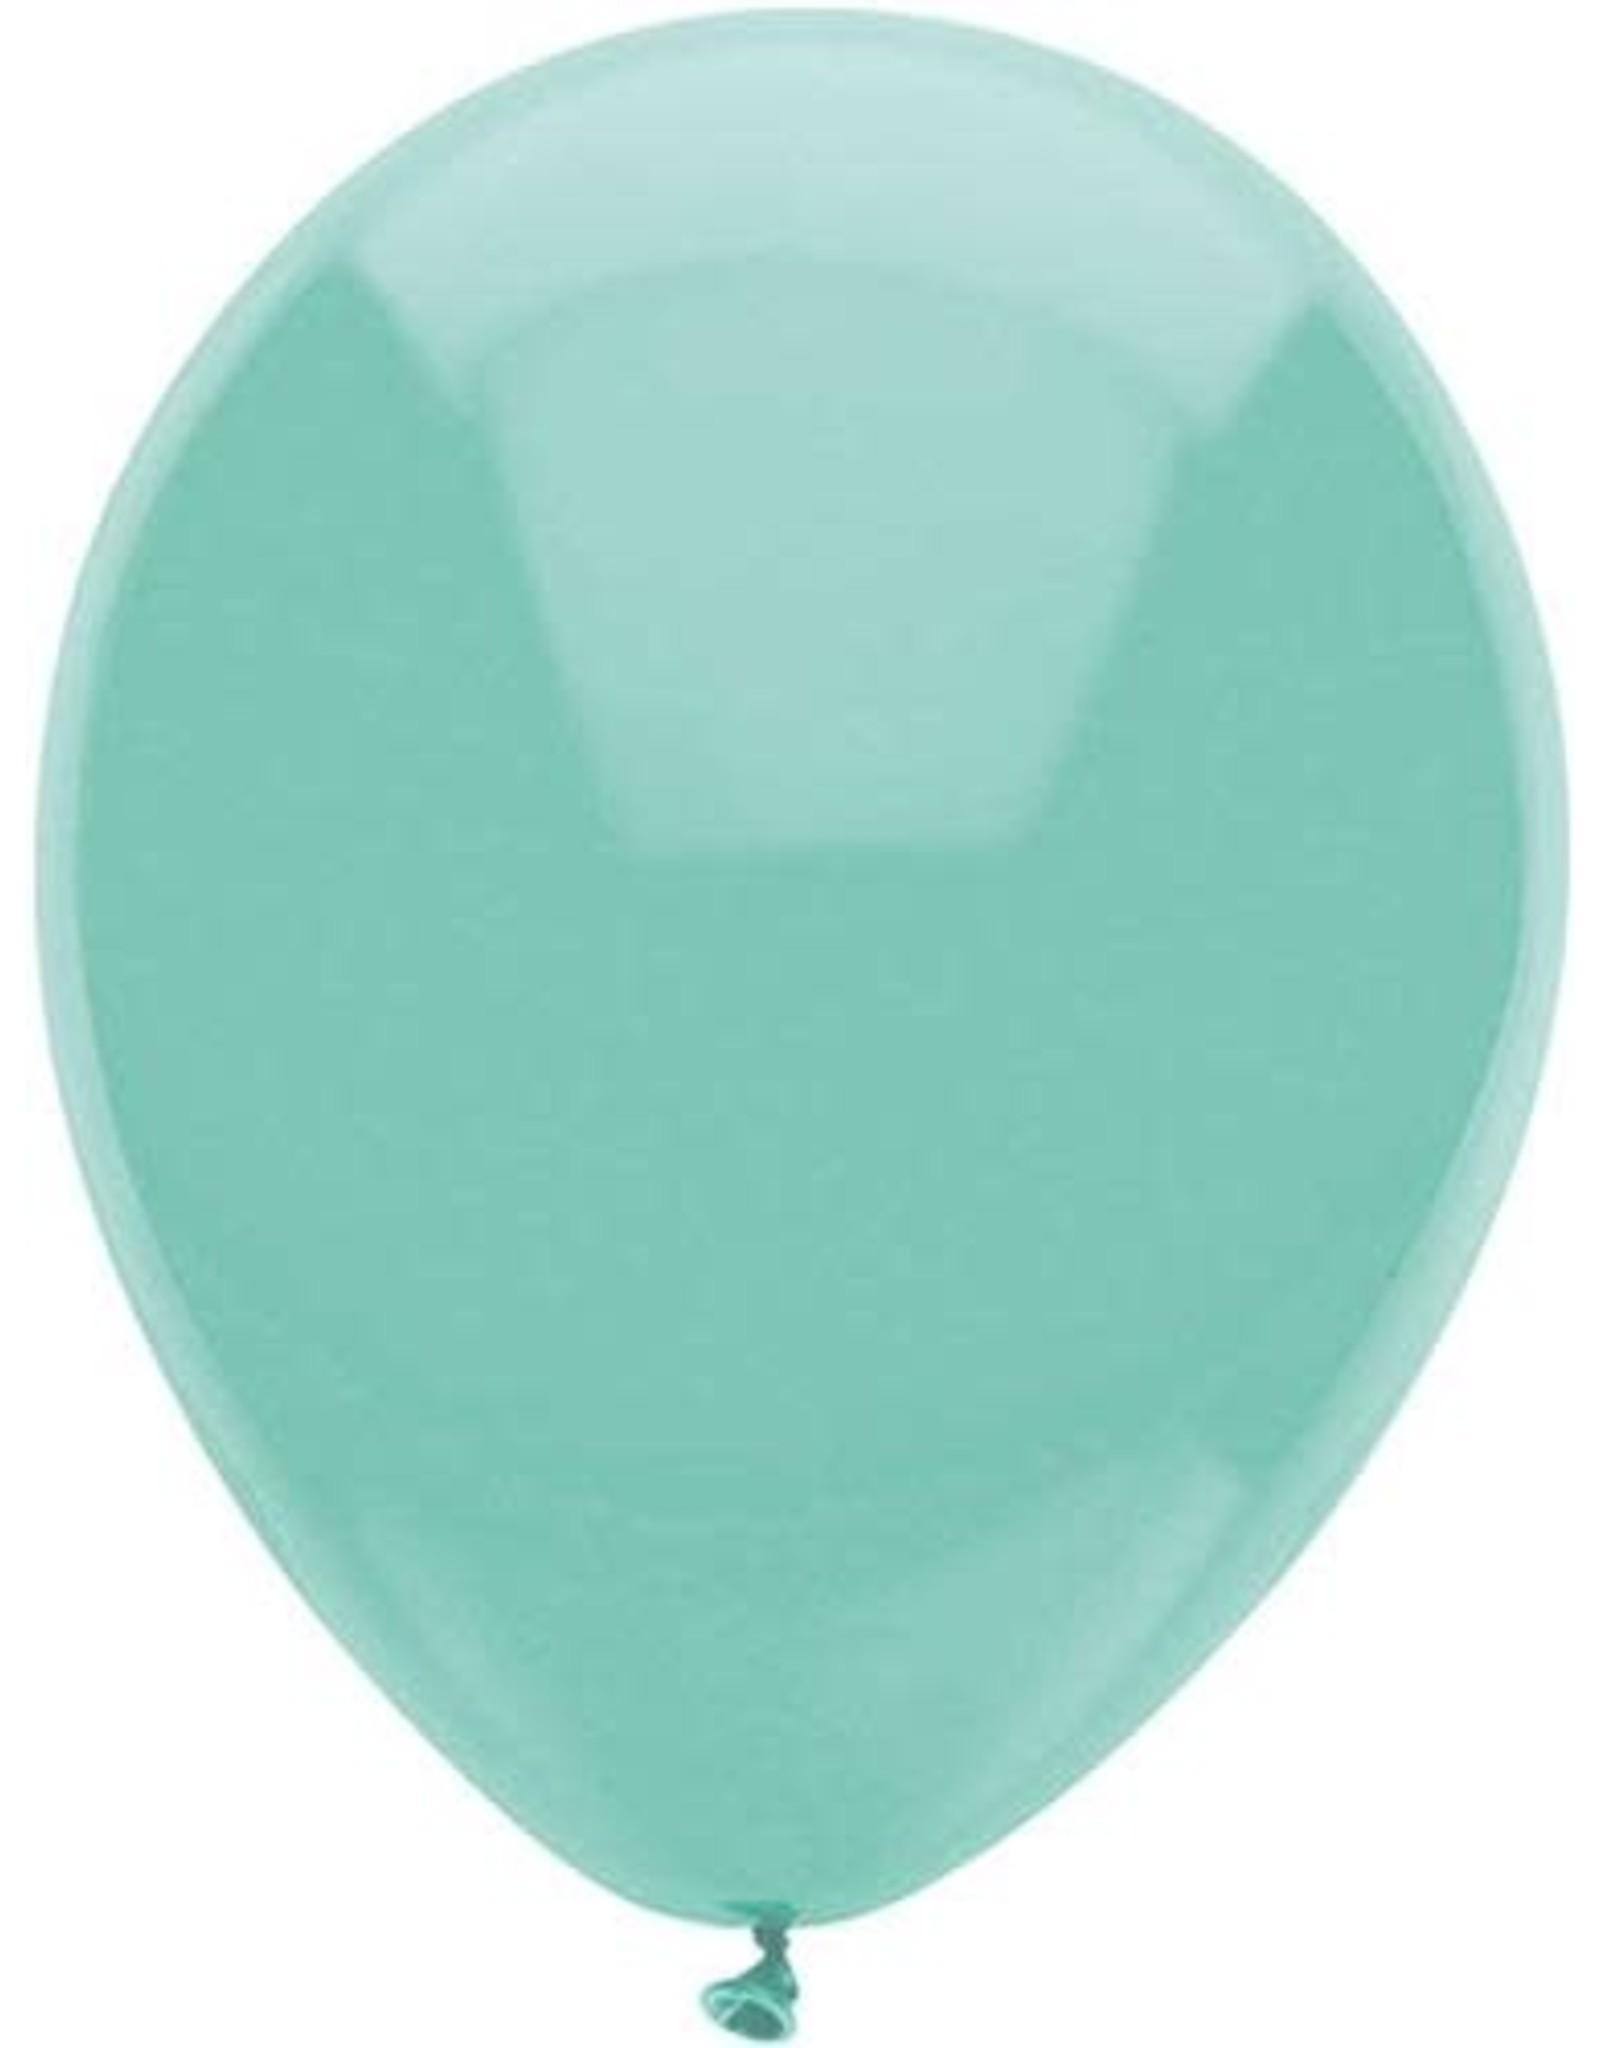 Ballonnen Uni Mint (30 cm, 100 stuks)